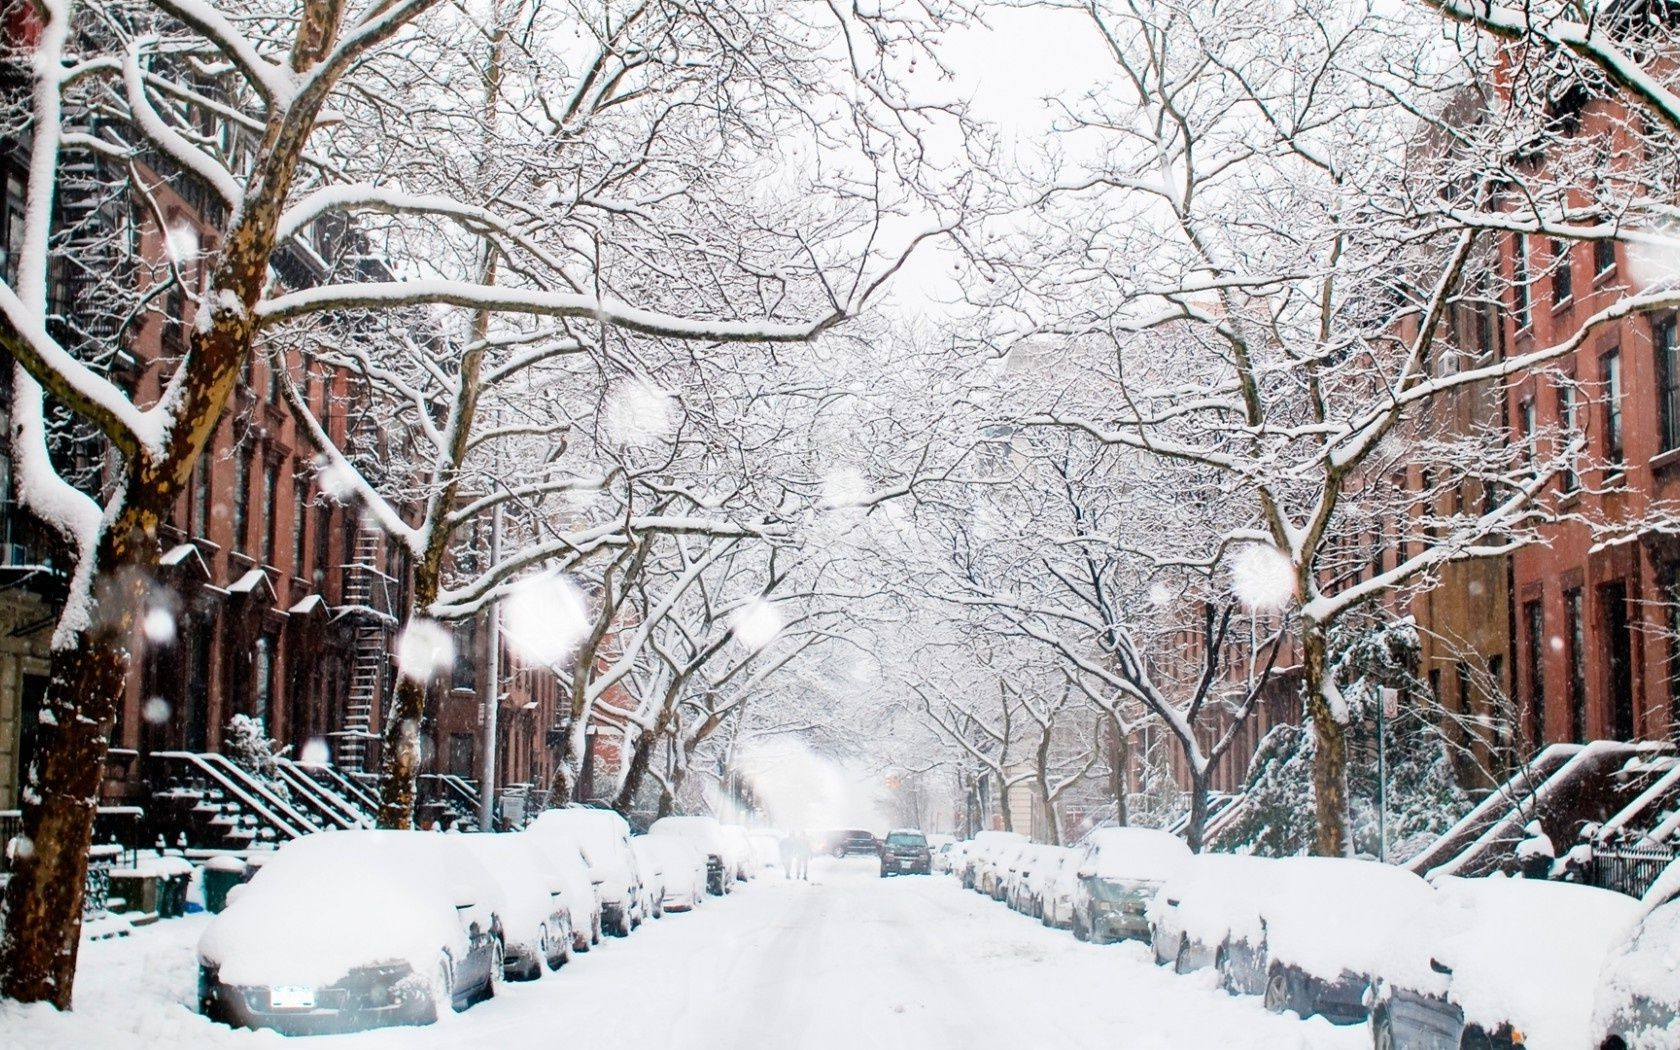 Winter City Wallpaper Posted By Sarah Mercado